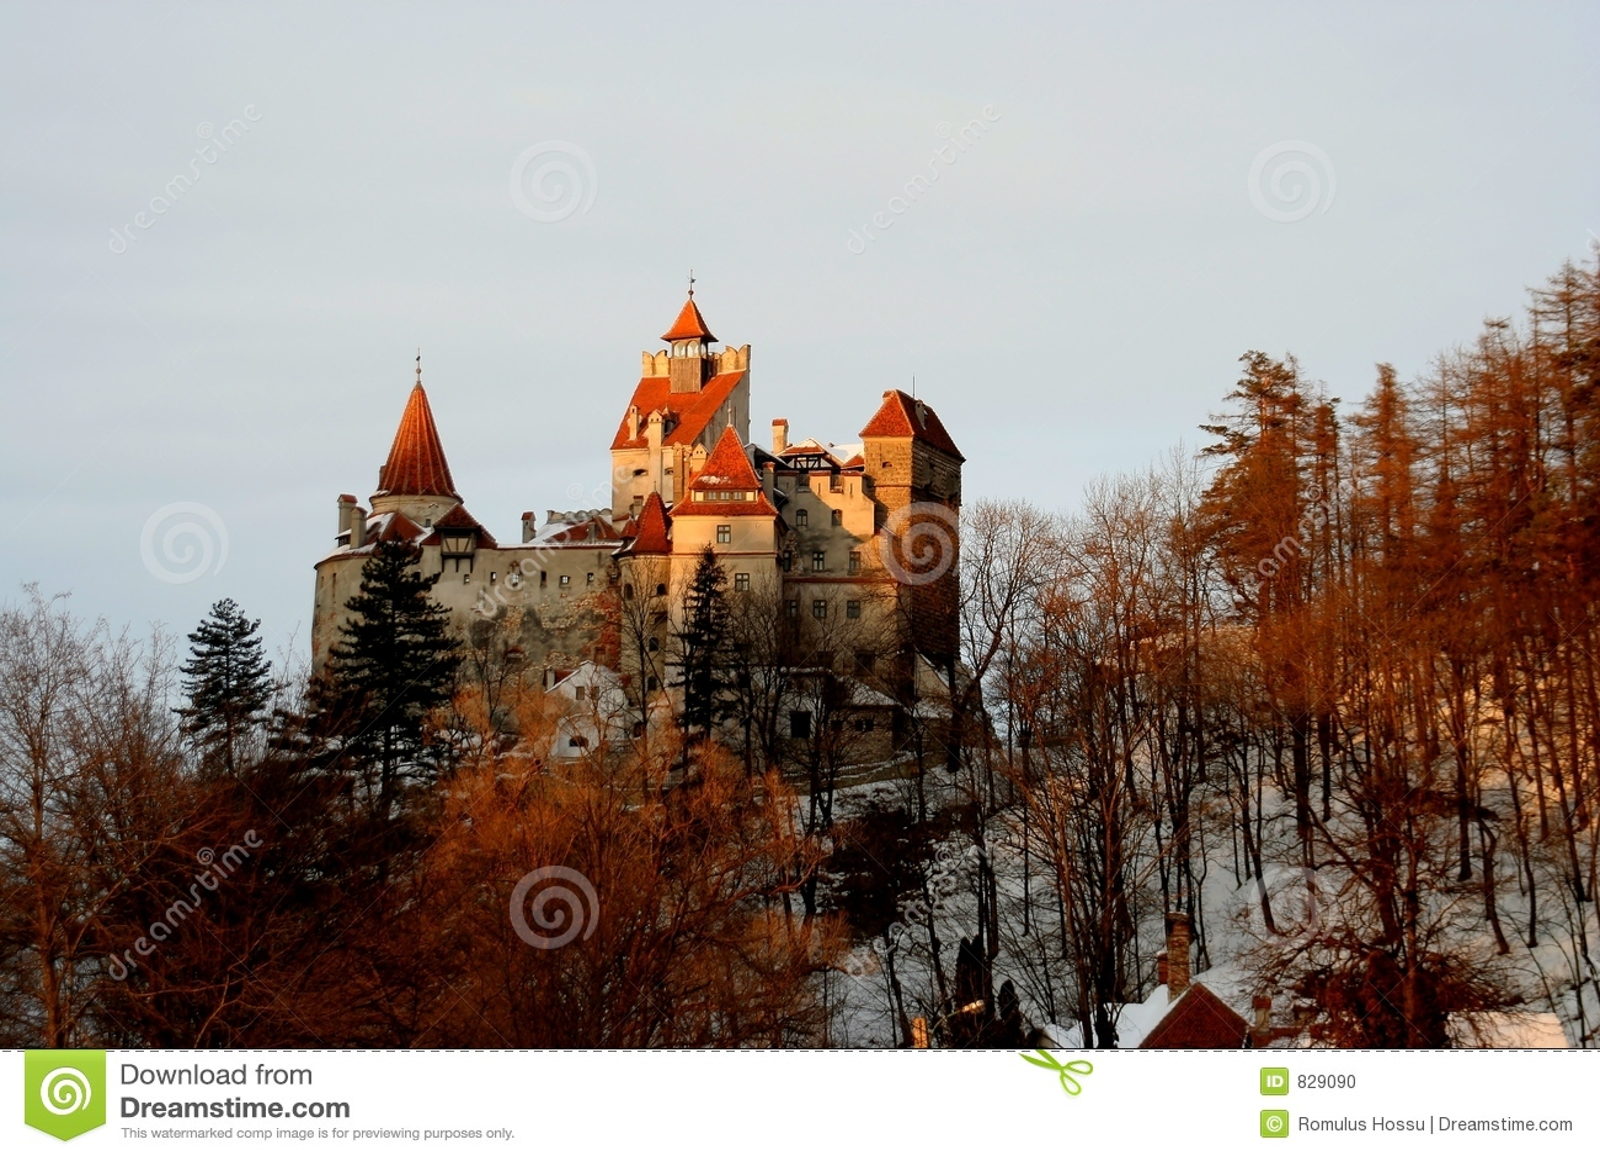 Dracula s Castle - Dusk